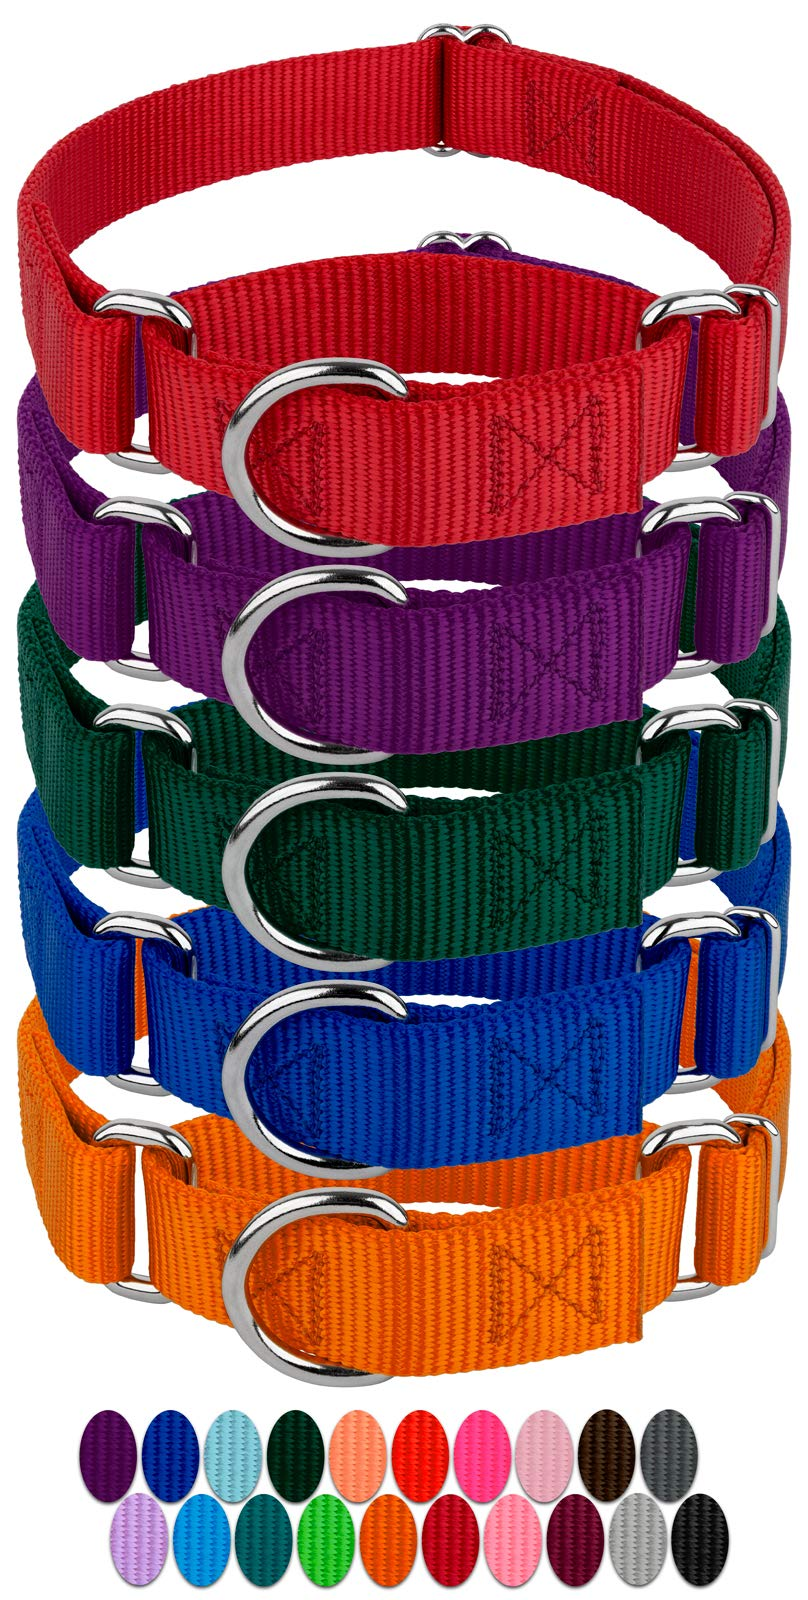 Country Brook Design 10 1 1/2 Inch Martingale Heavyduty Nylon Dog Collars (Medium, 1 1/2 Inch Wide, Assorted)